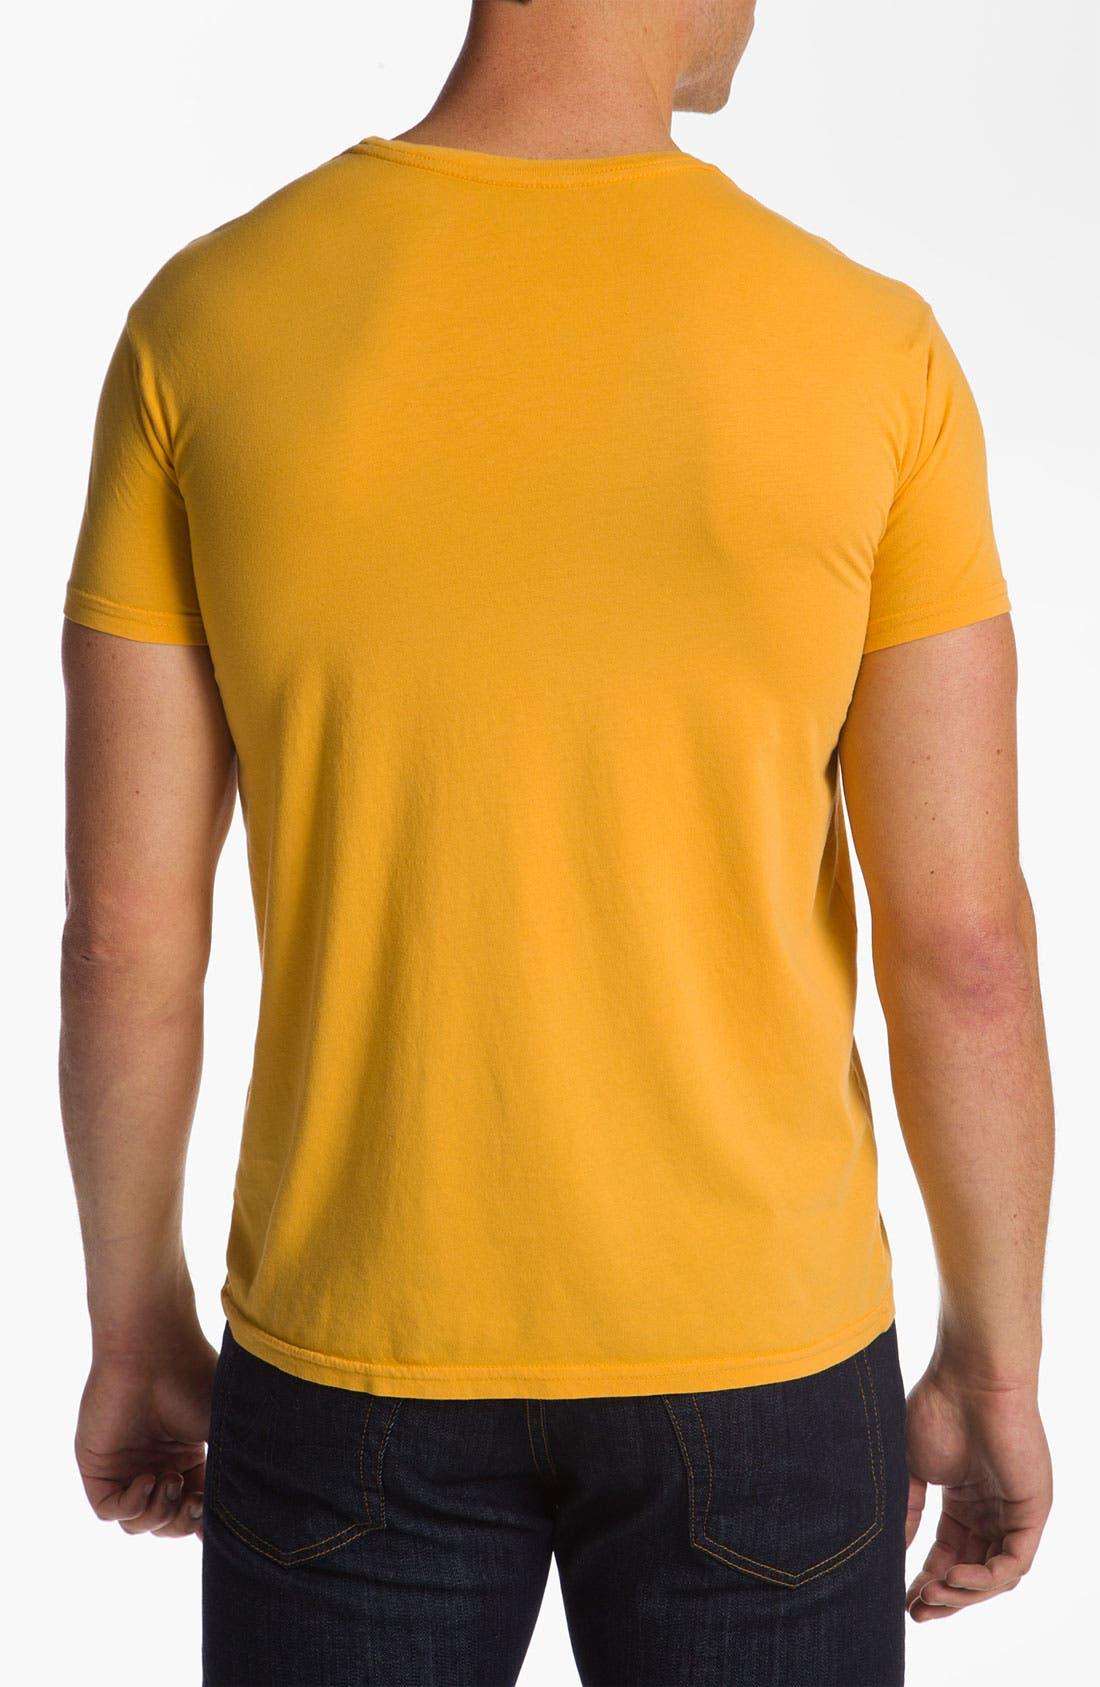 Alternate Image 2  - The Original Retro Brand 'Pittsburgh Panthers' T-Shirt